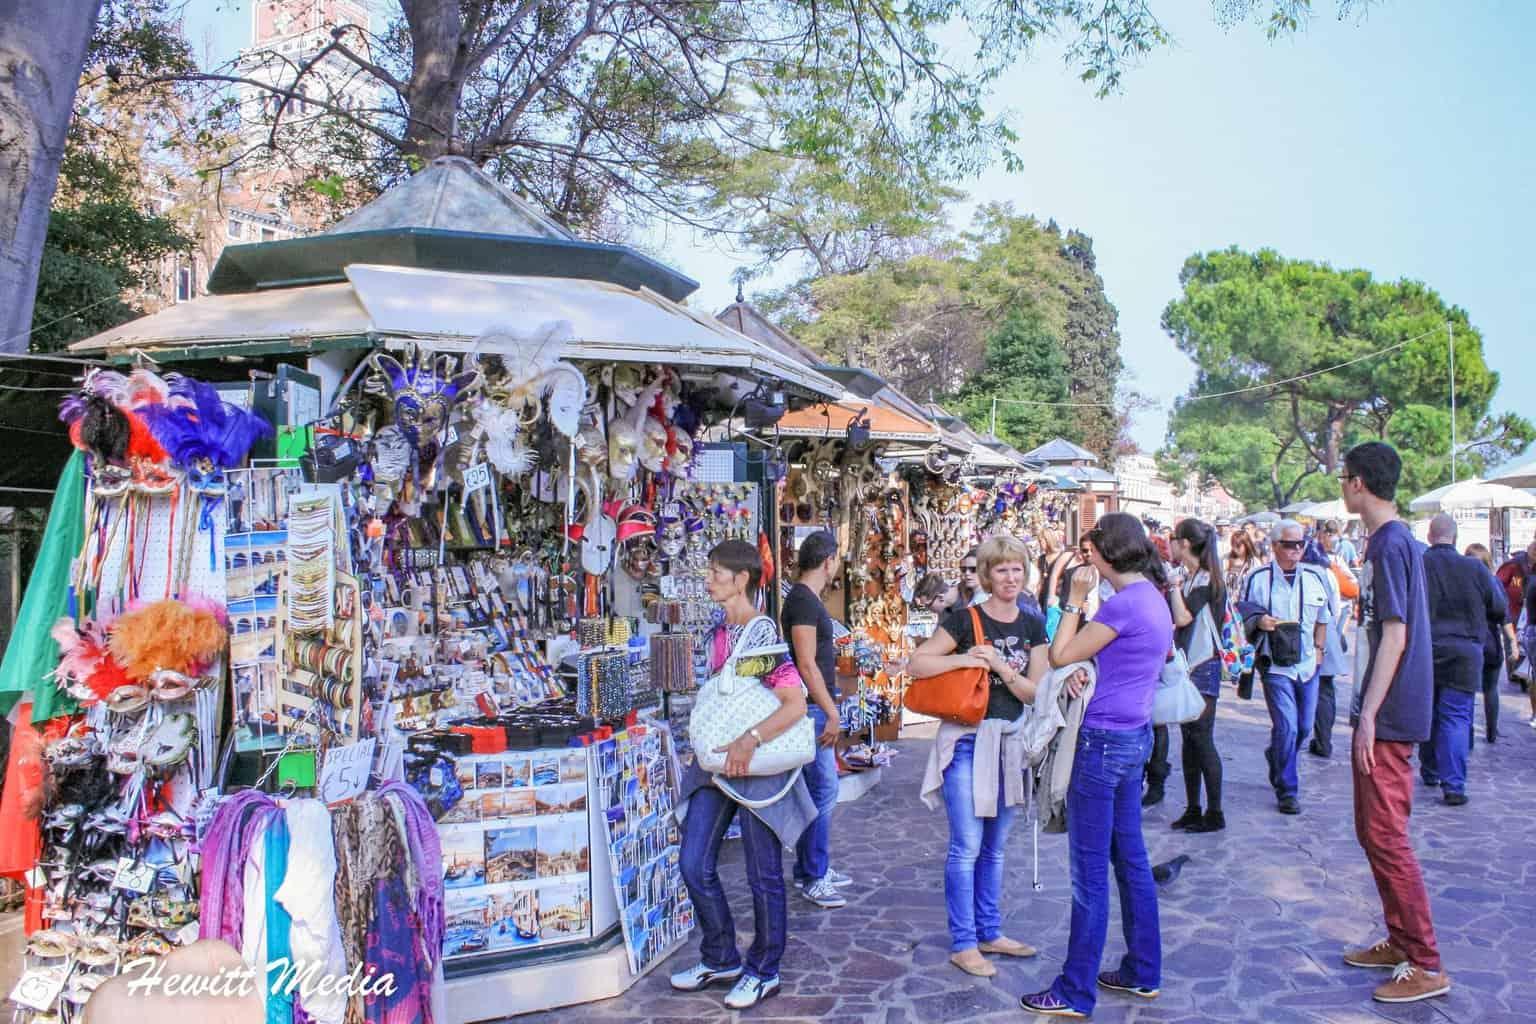 Street vendors in Venice, Italy